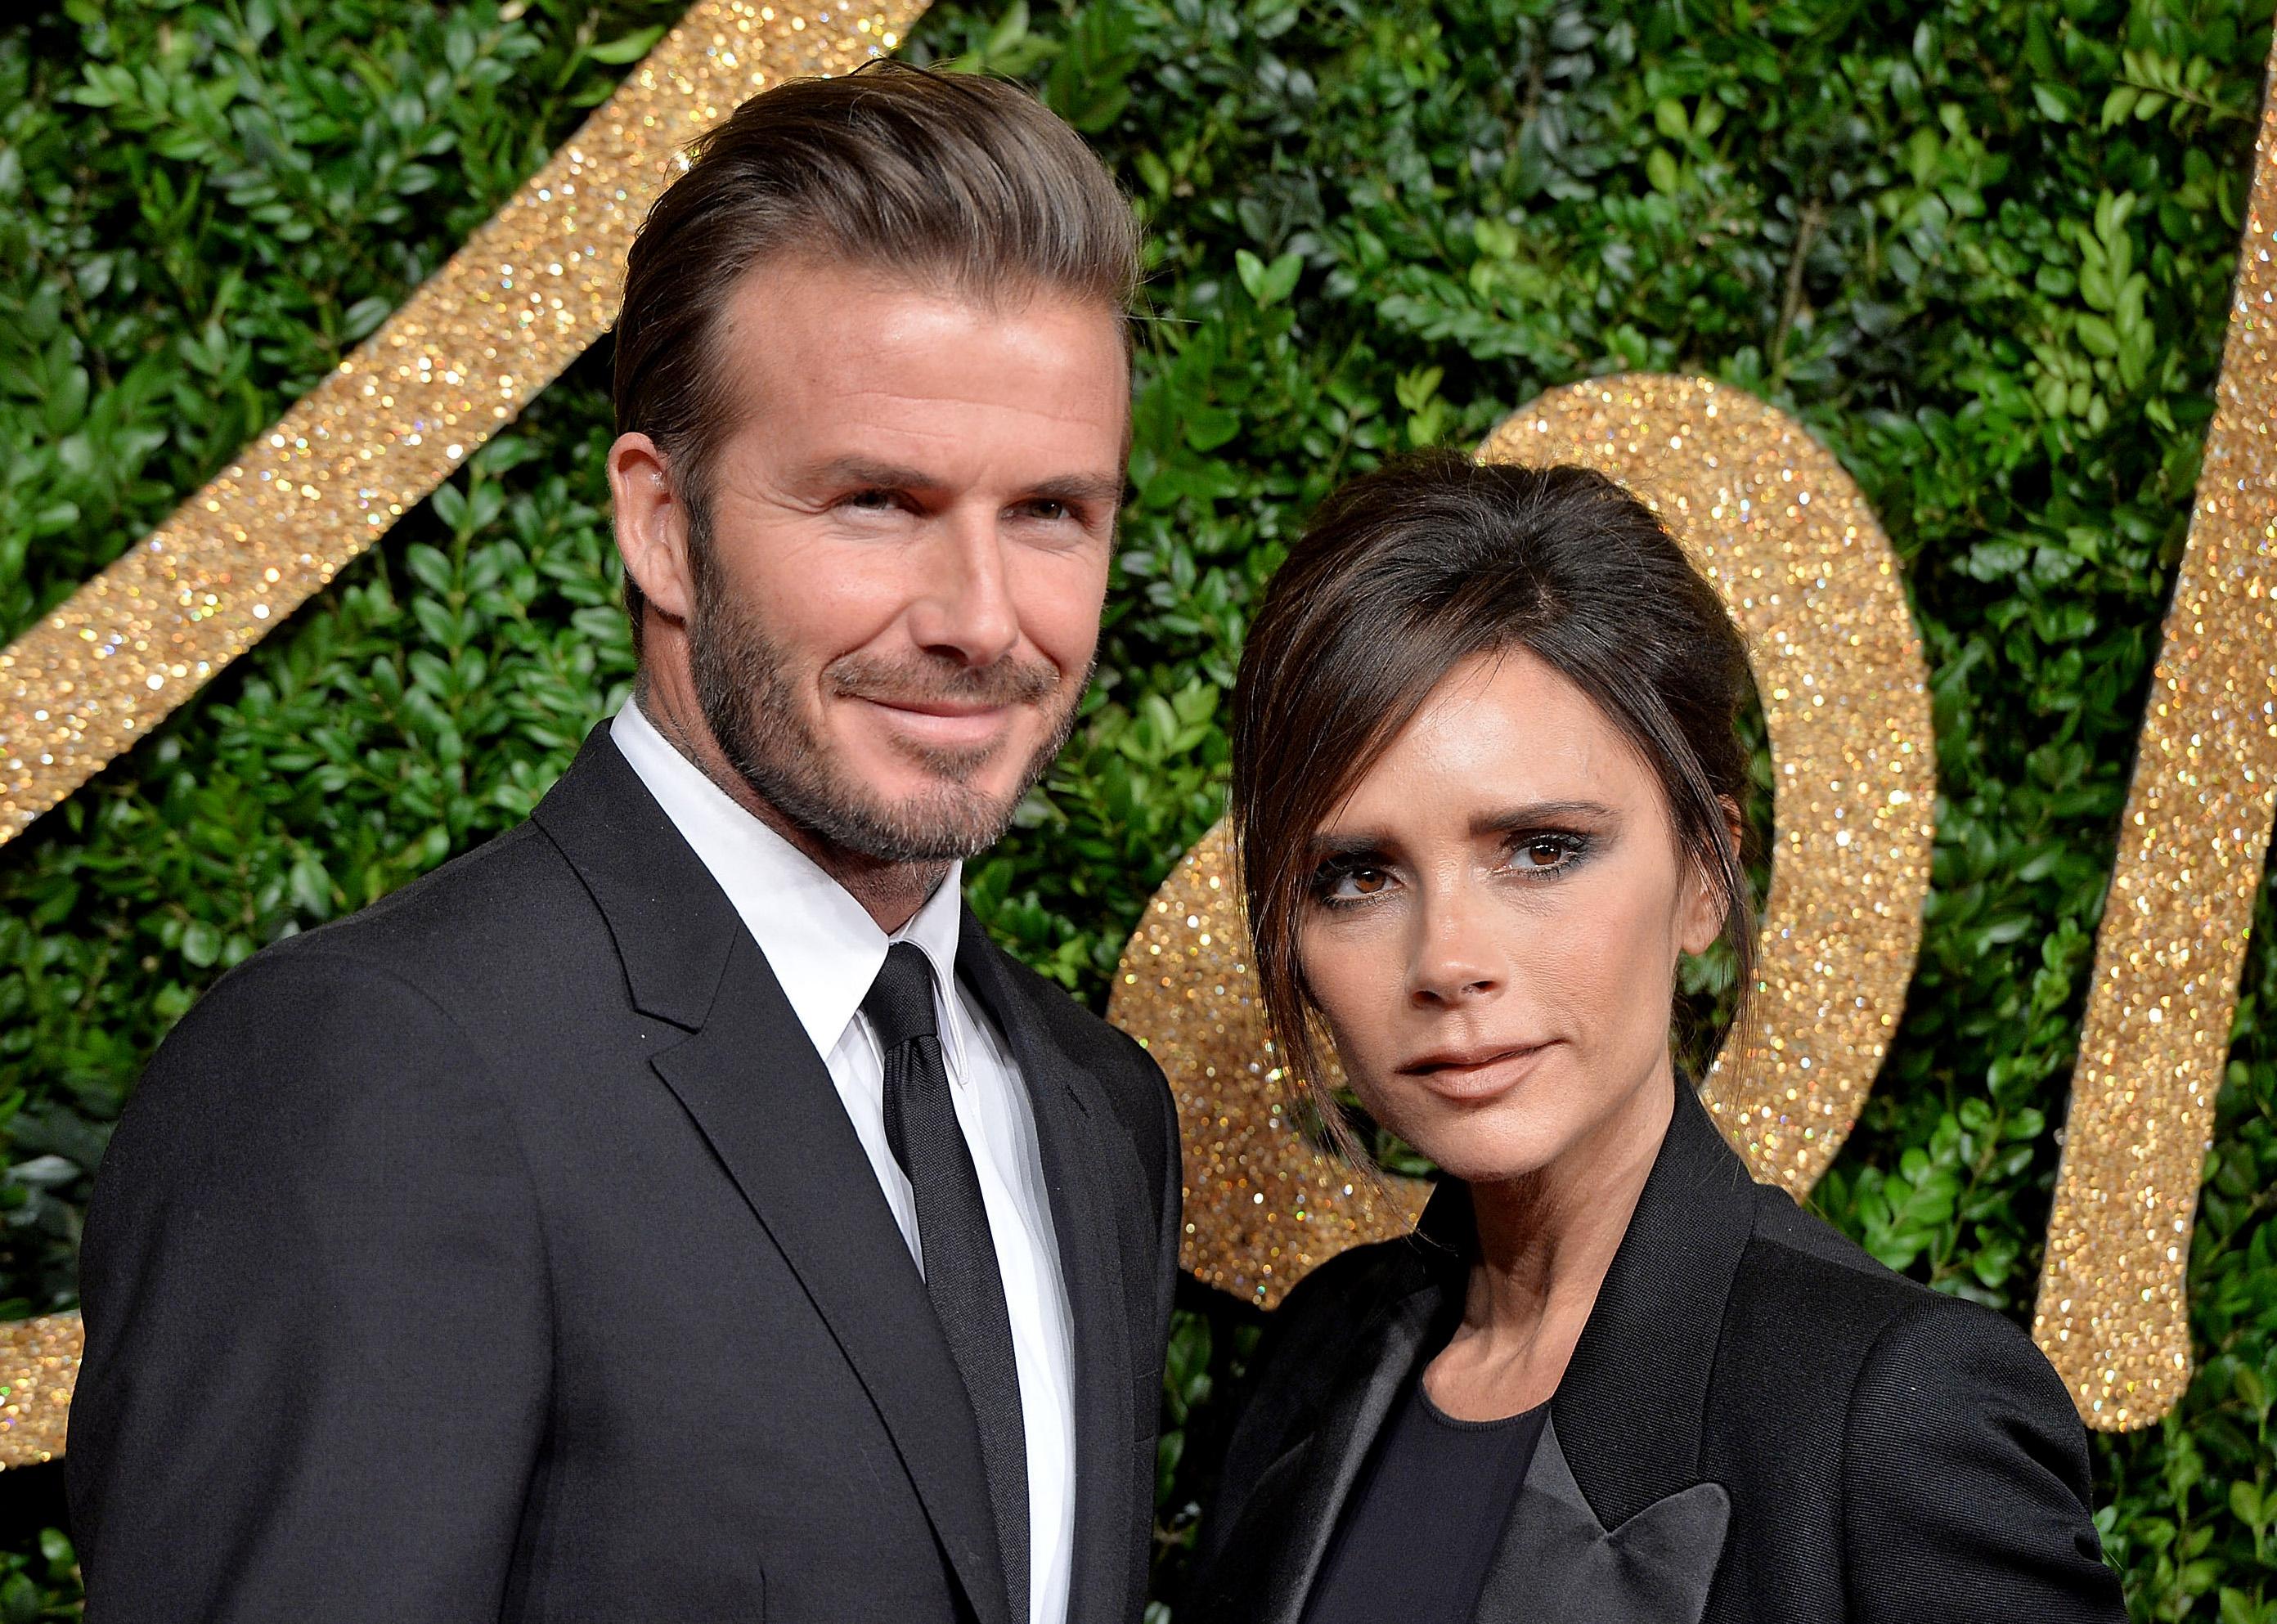 David Victoria Beckham